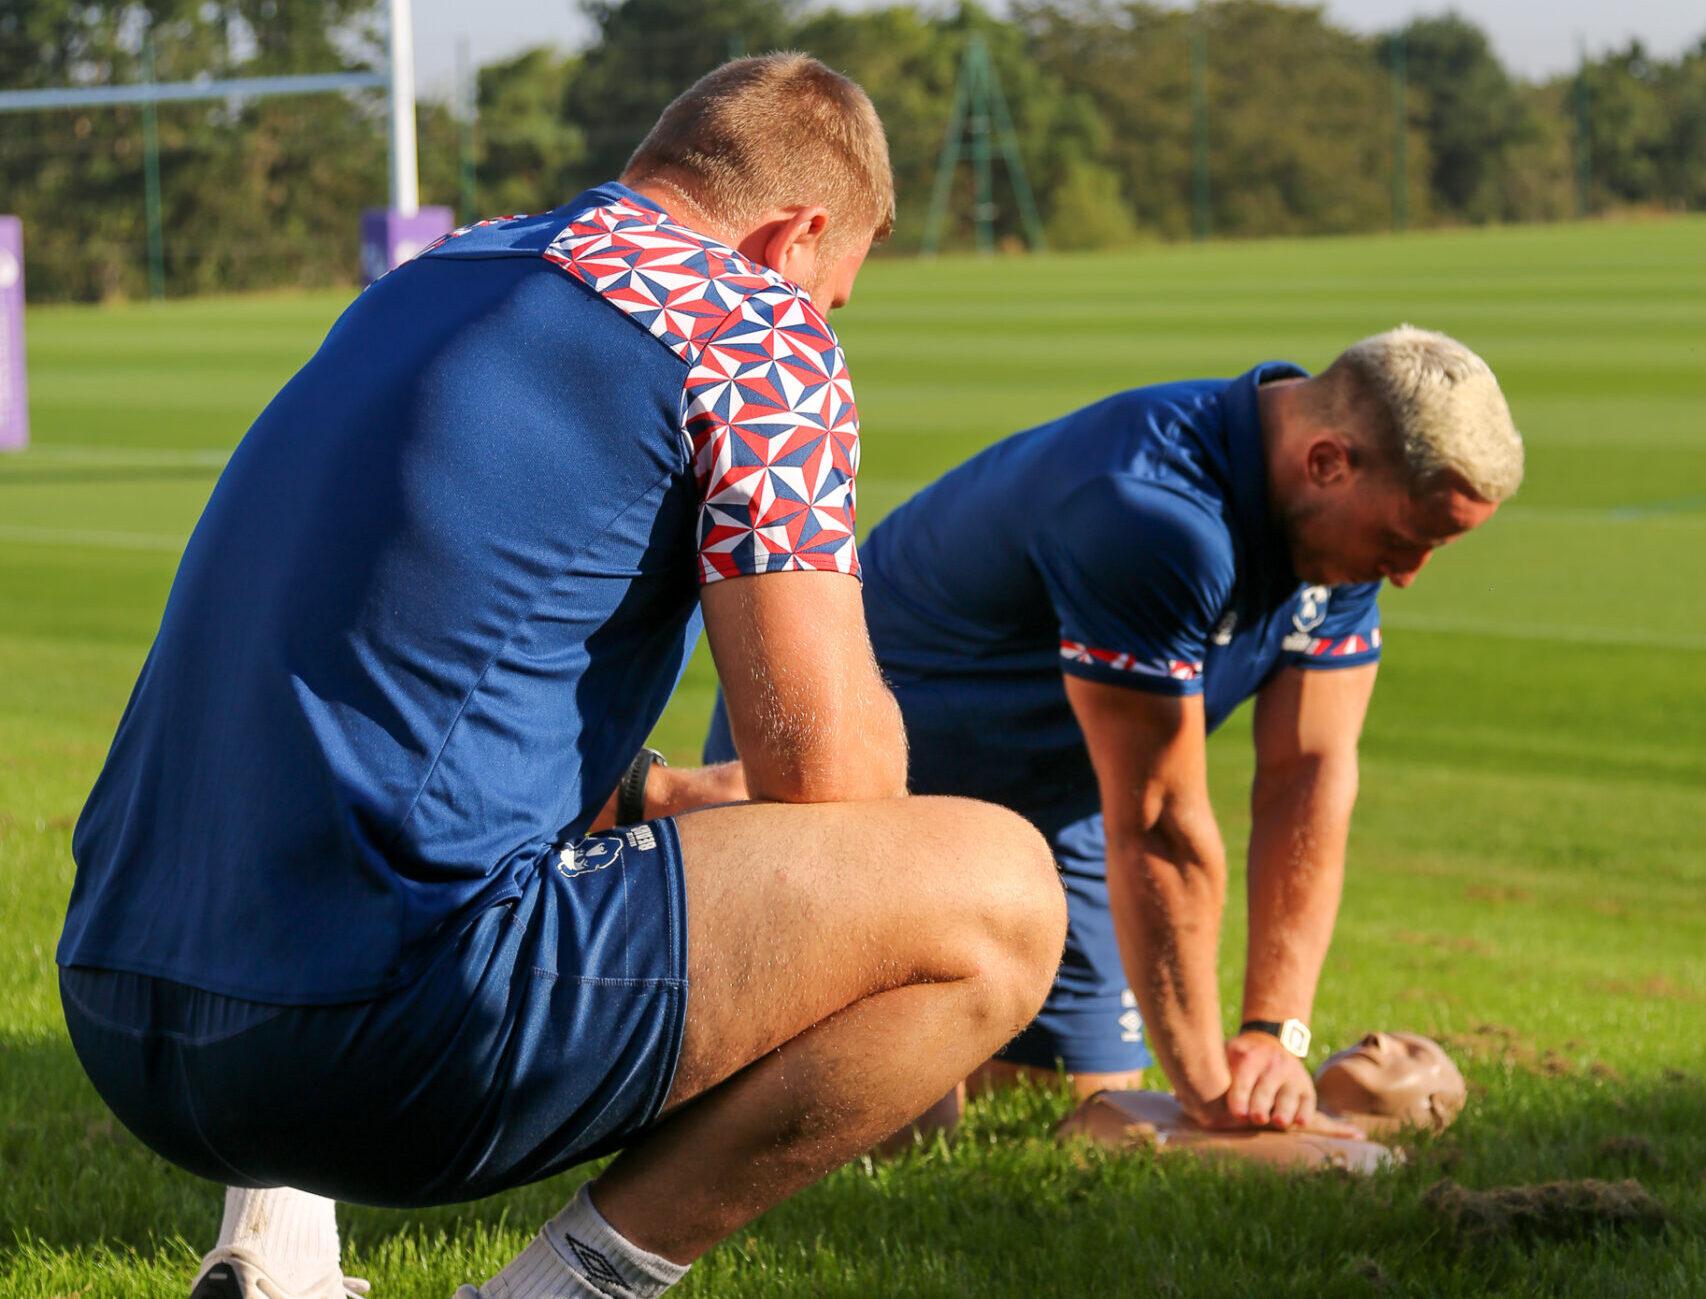 Critical care team teach lifesaving CPR skills to Bristol Bears Premier Rugby Squad